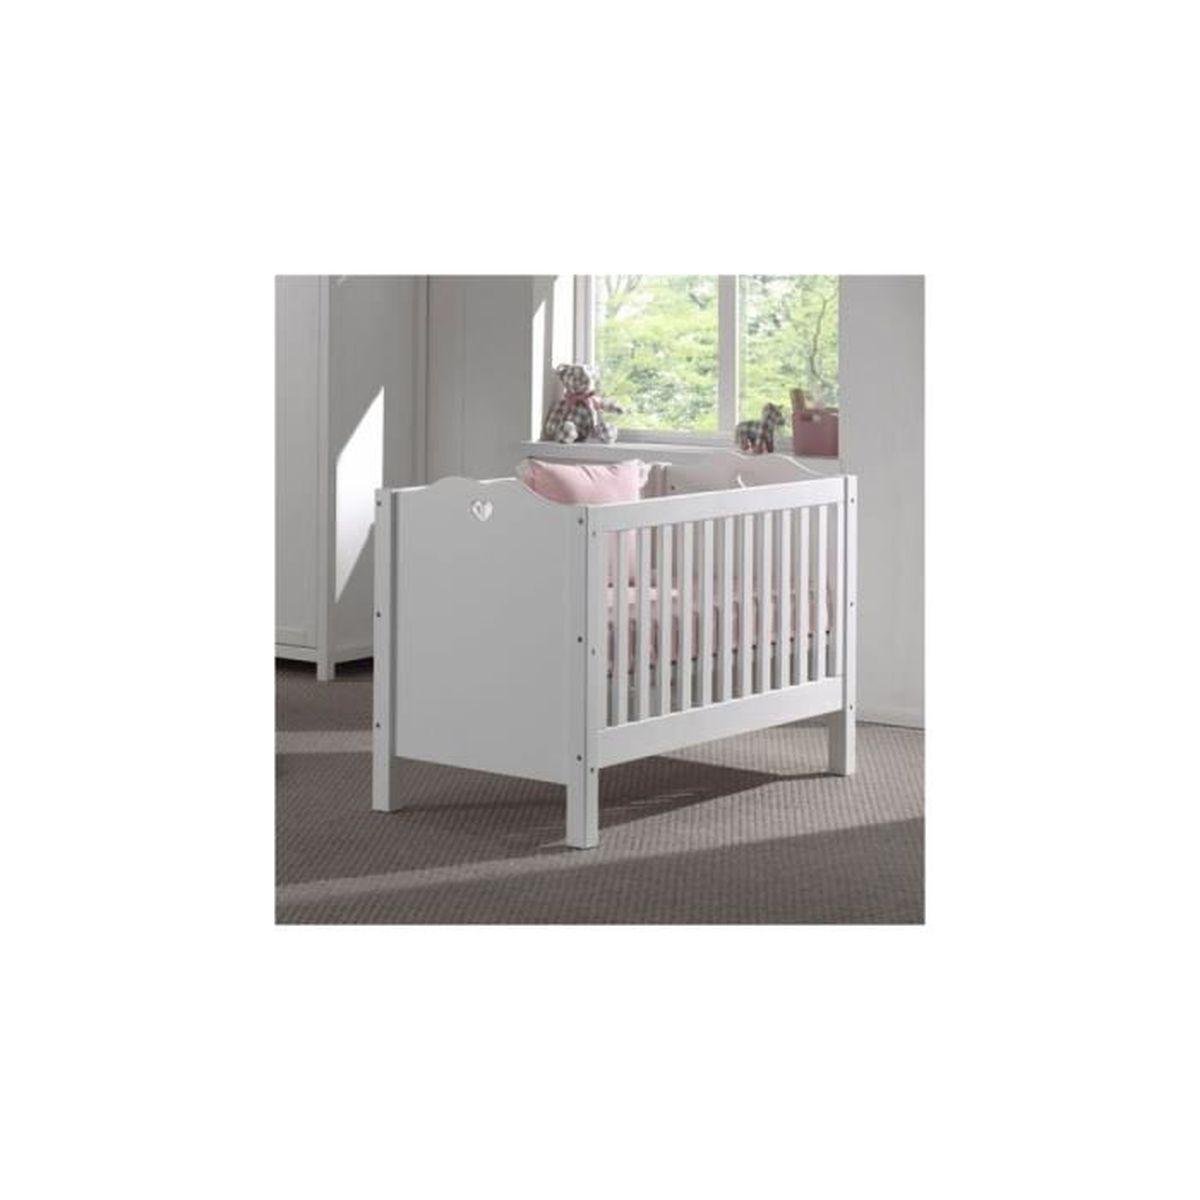 vipack lit bebe blanc amori achat vente lit b b 5420070220743 cdiscount. Black Bedroom Furniture Sets. Home Design Ideas